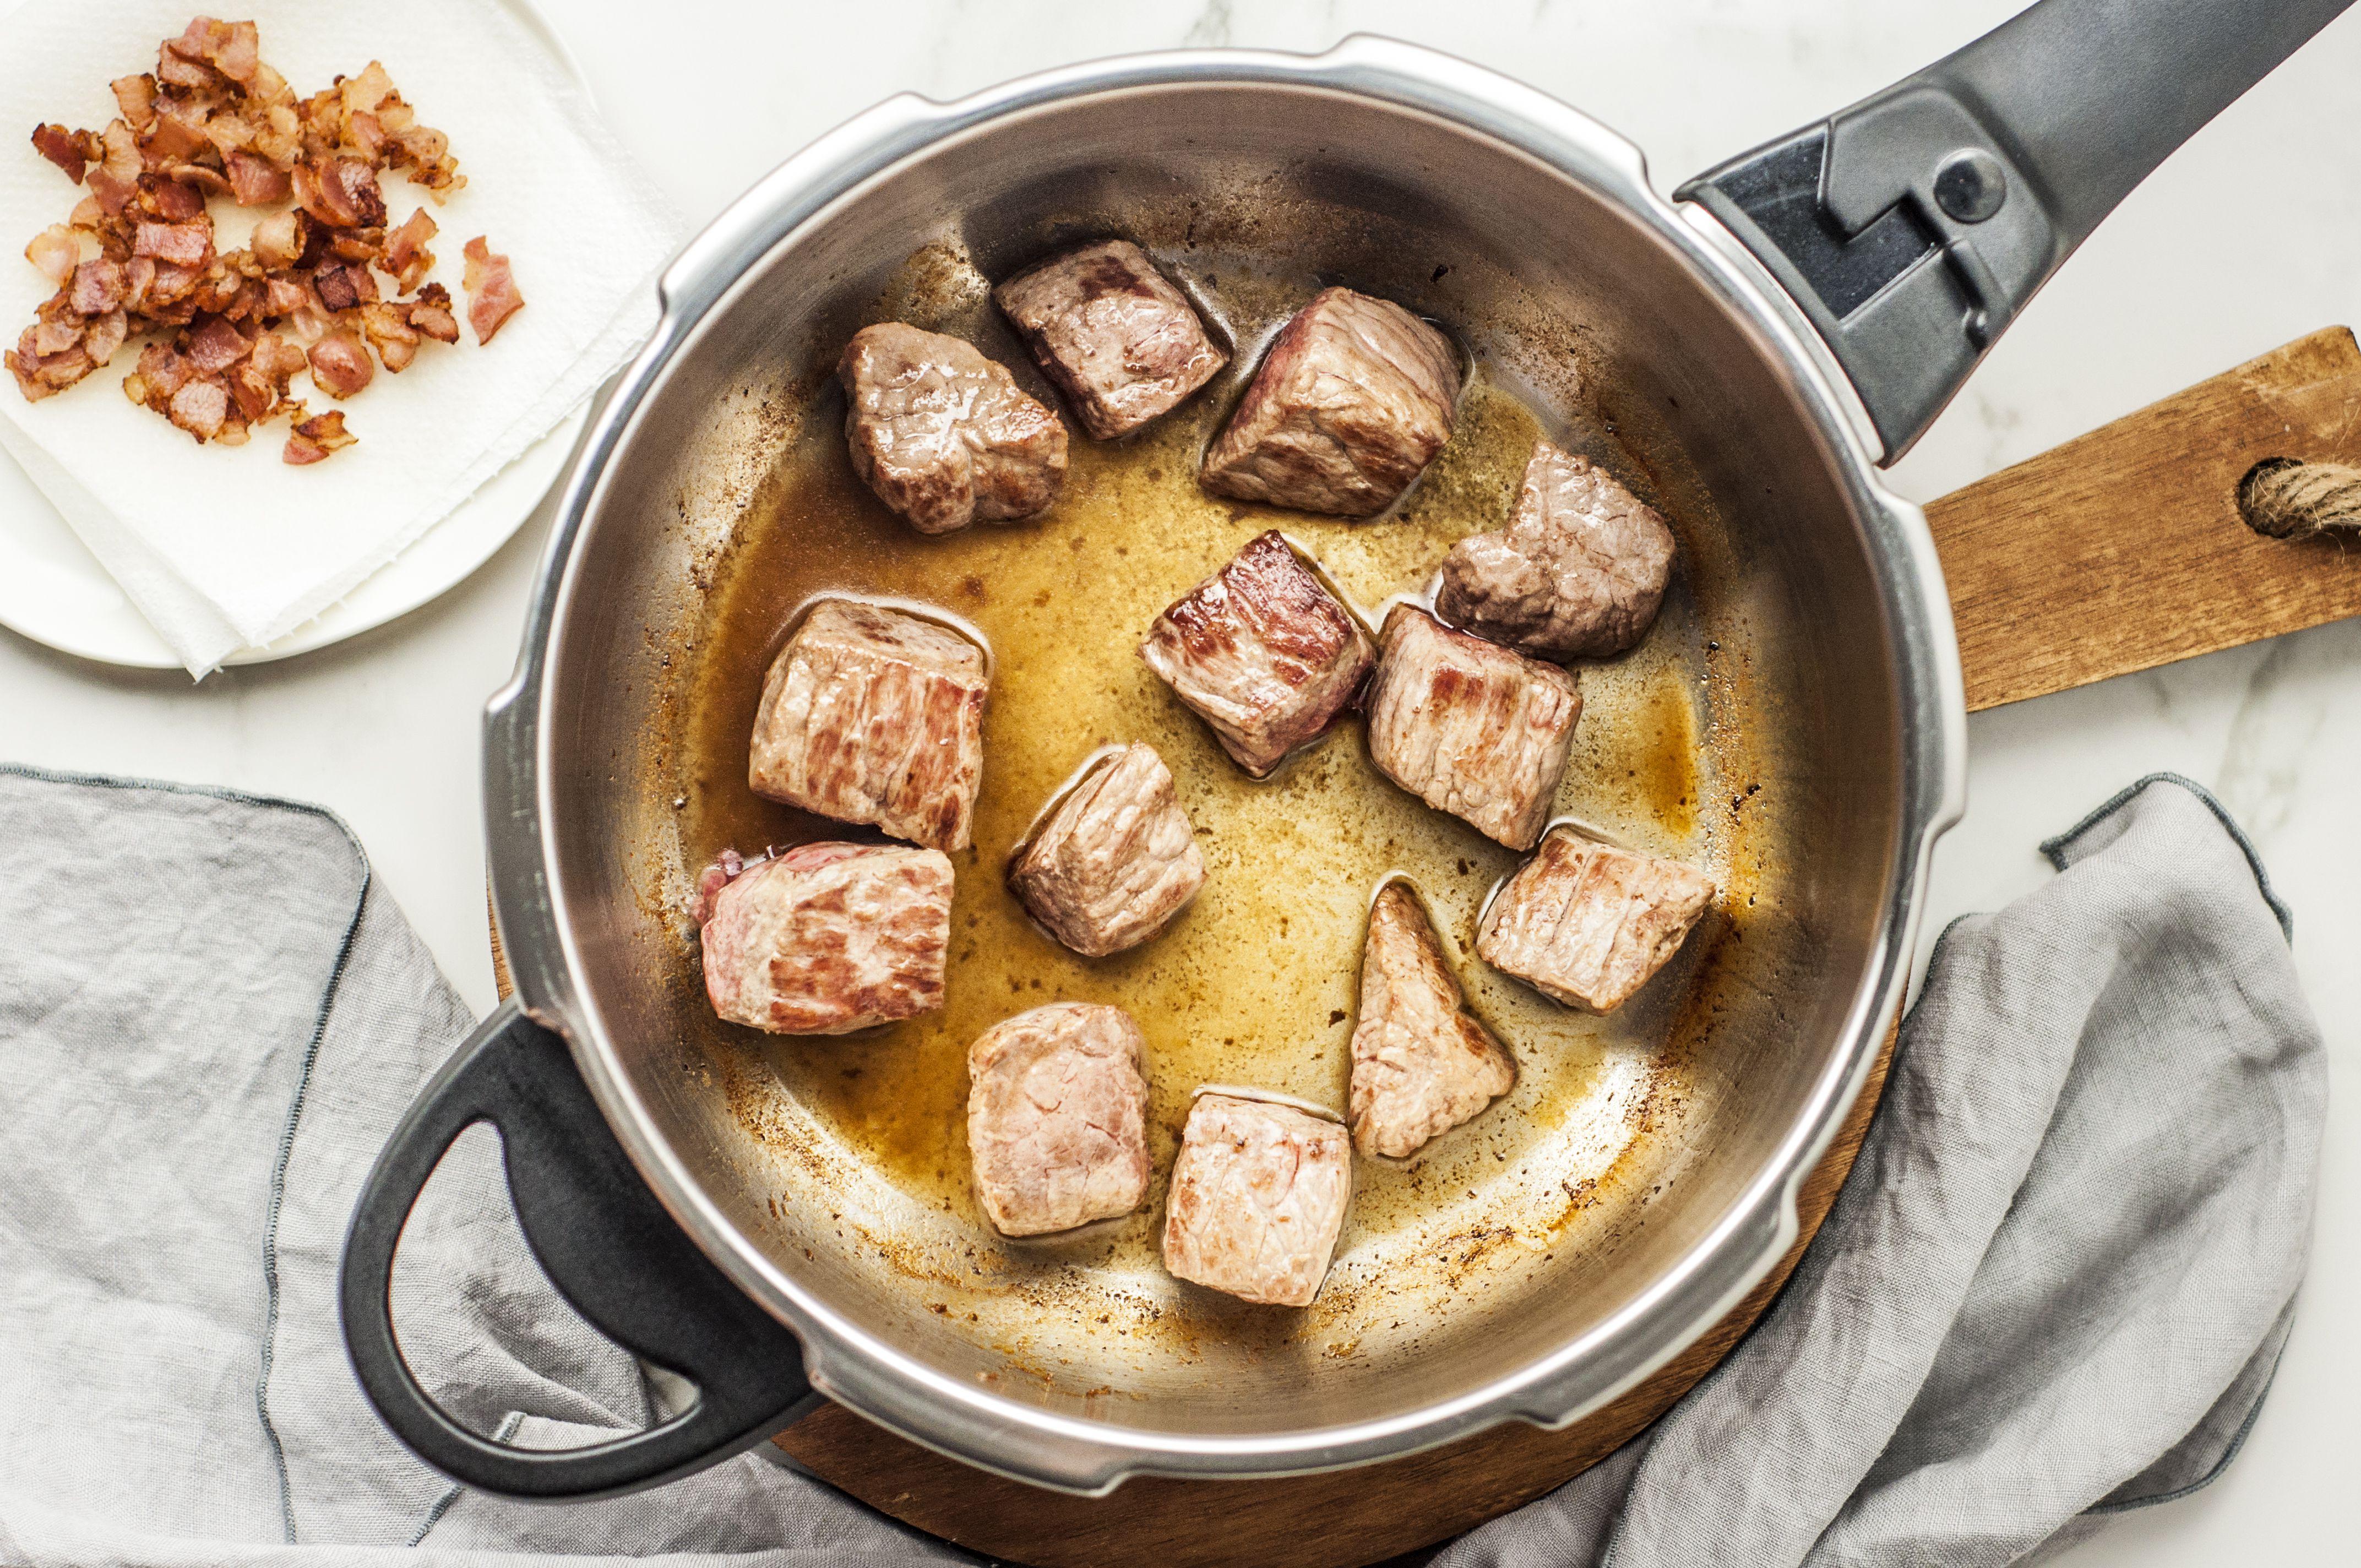 Cut the steak into cubes